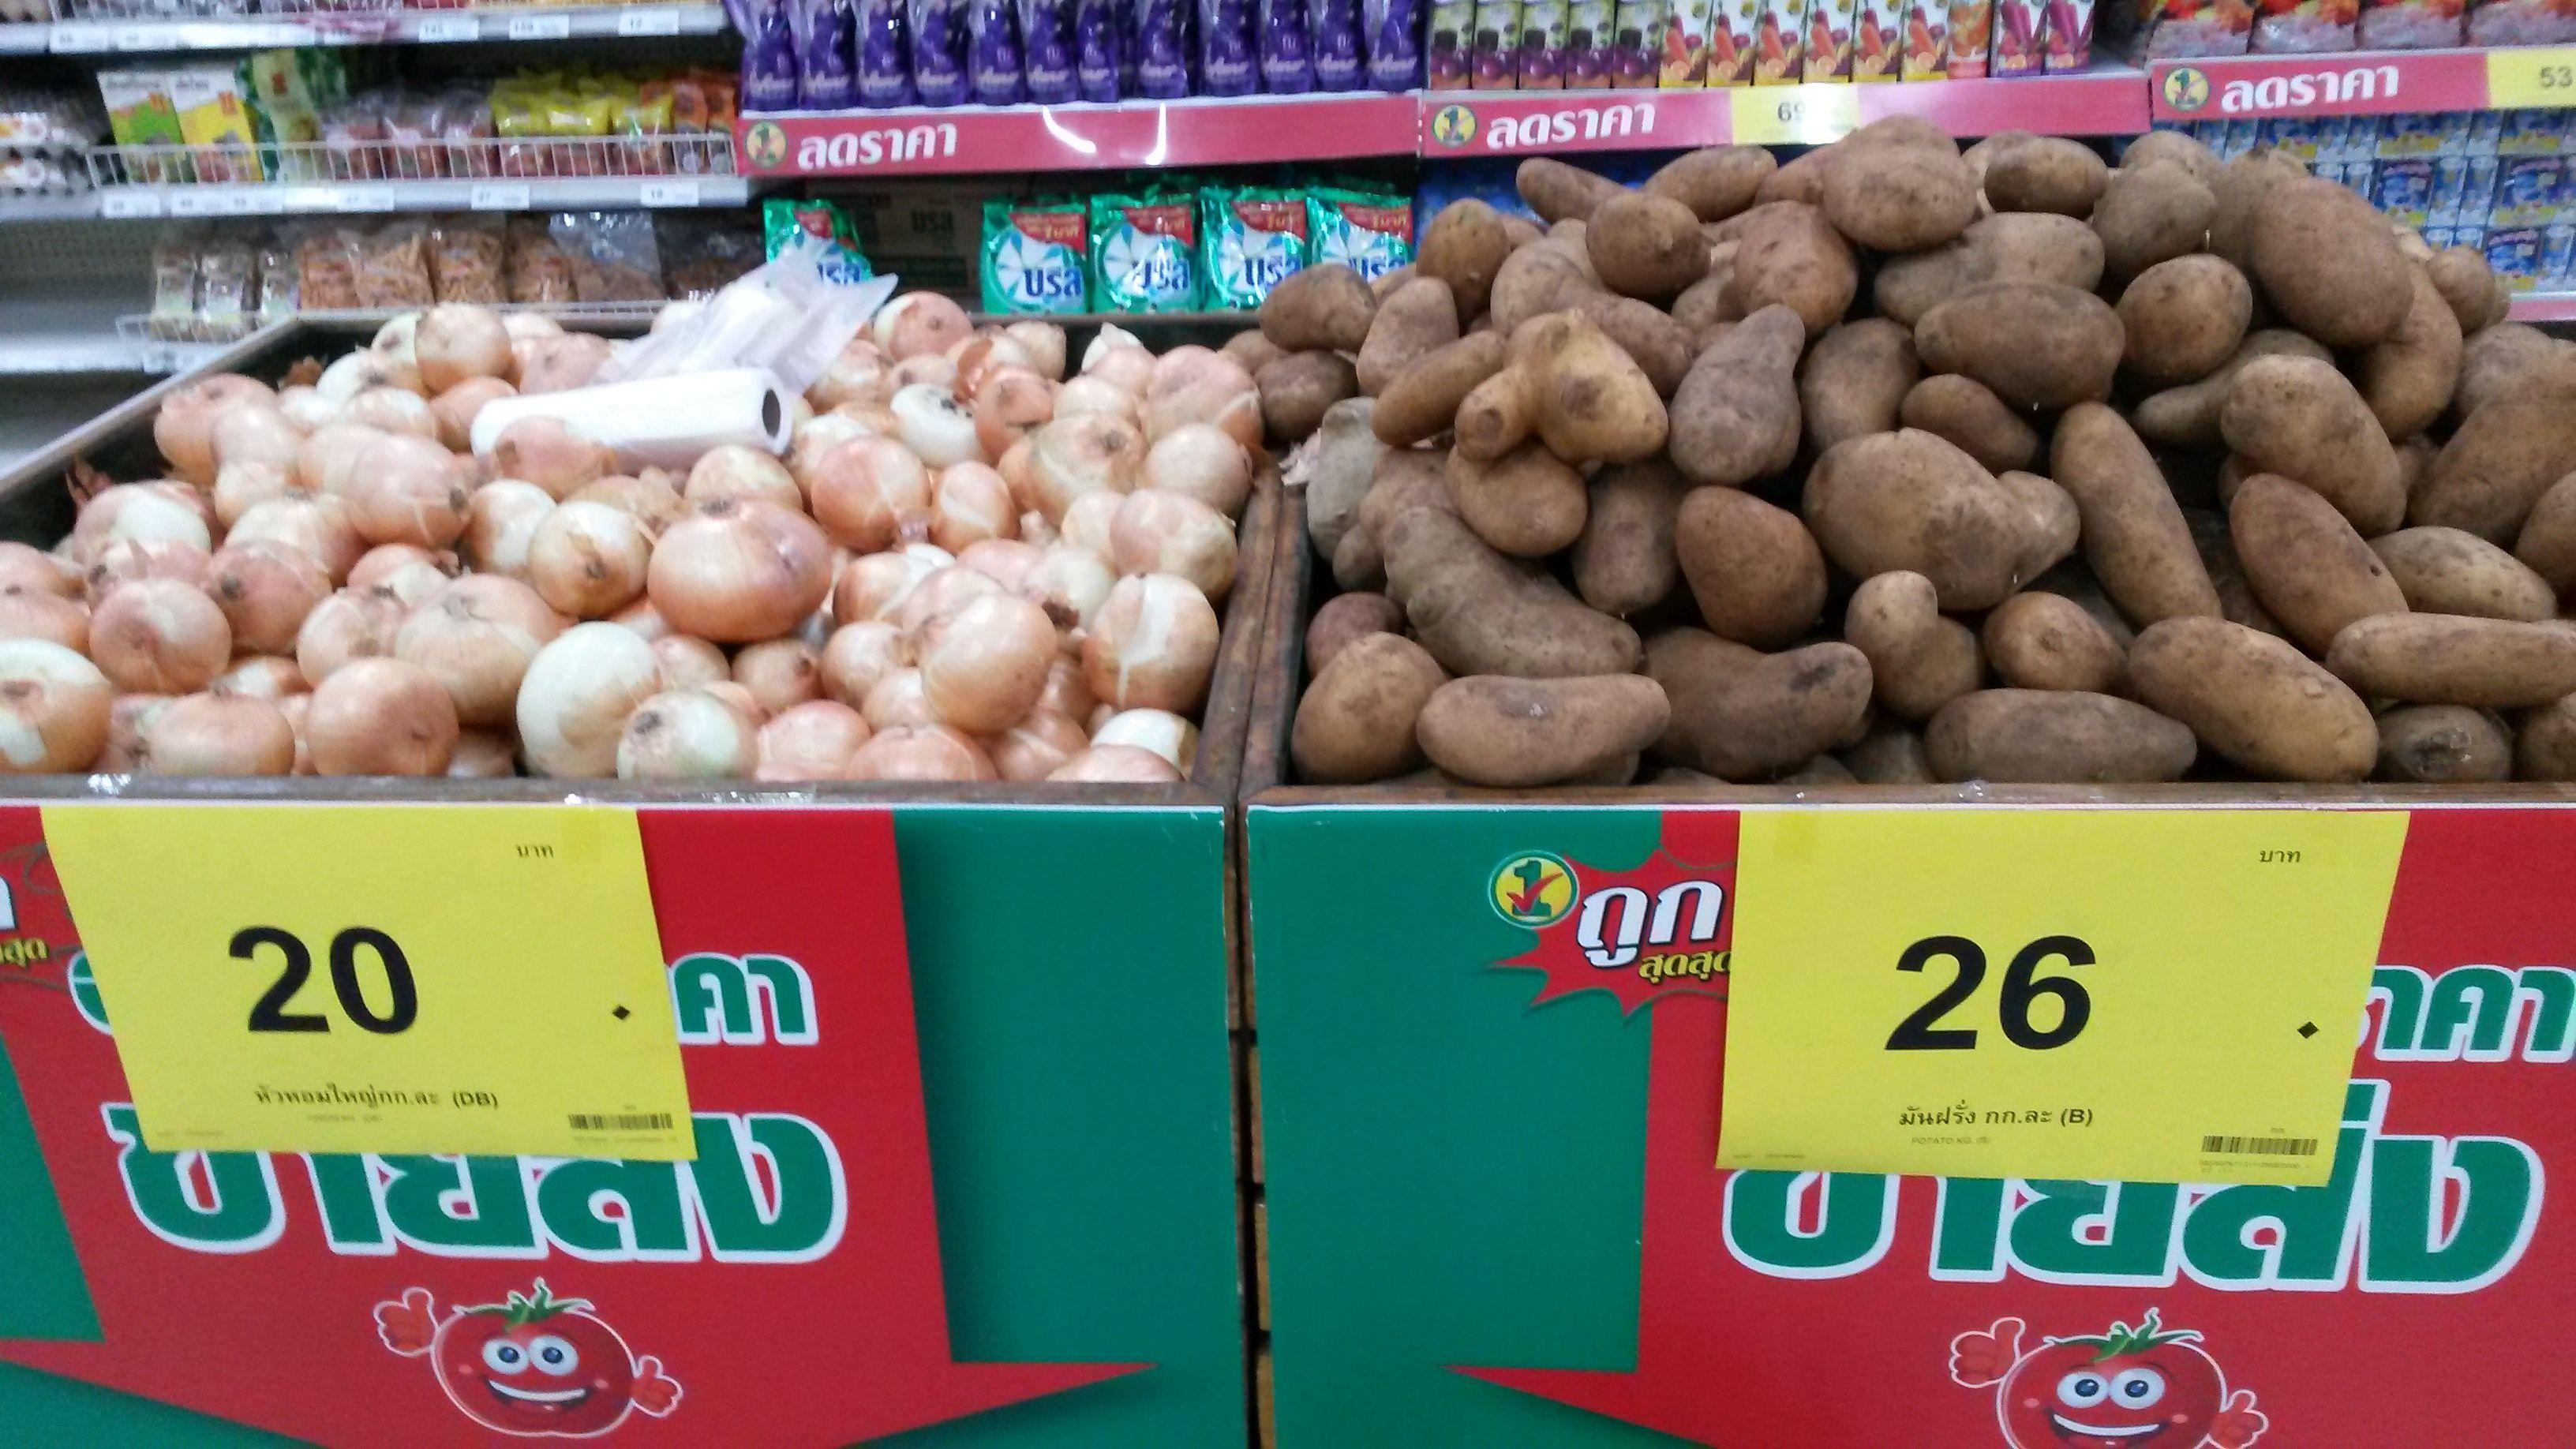 Lebensmittelpreise in Thailand